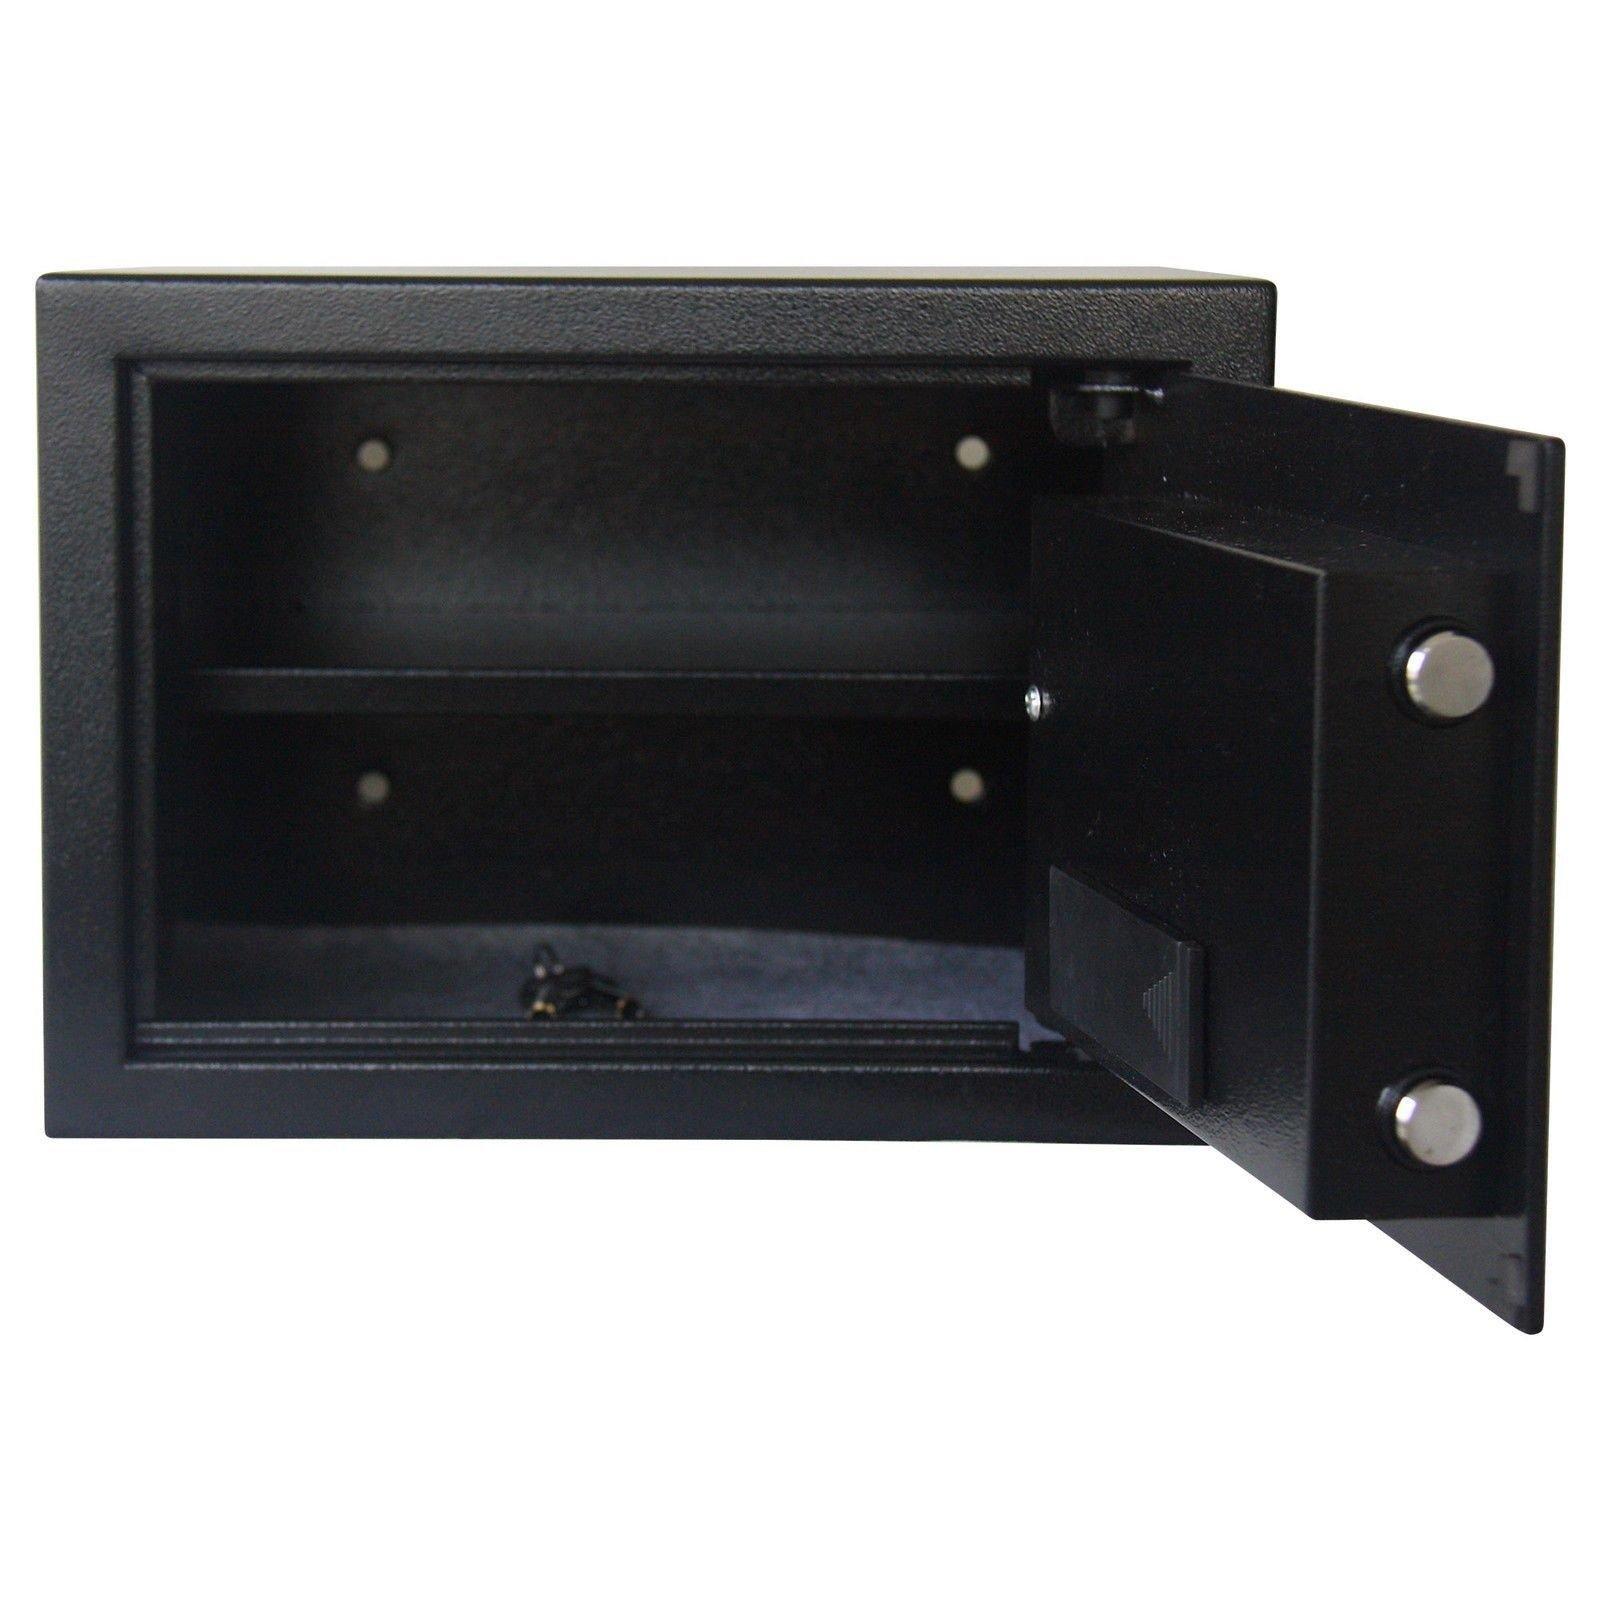 Stamo Electronic Digital Fingerprint Safe Fireproof Combination Box Keypad Lock Home Office Hotel Hide Cash Gun Valuables Black